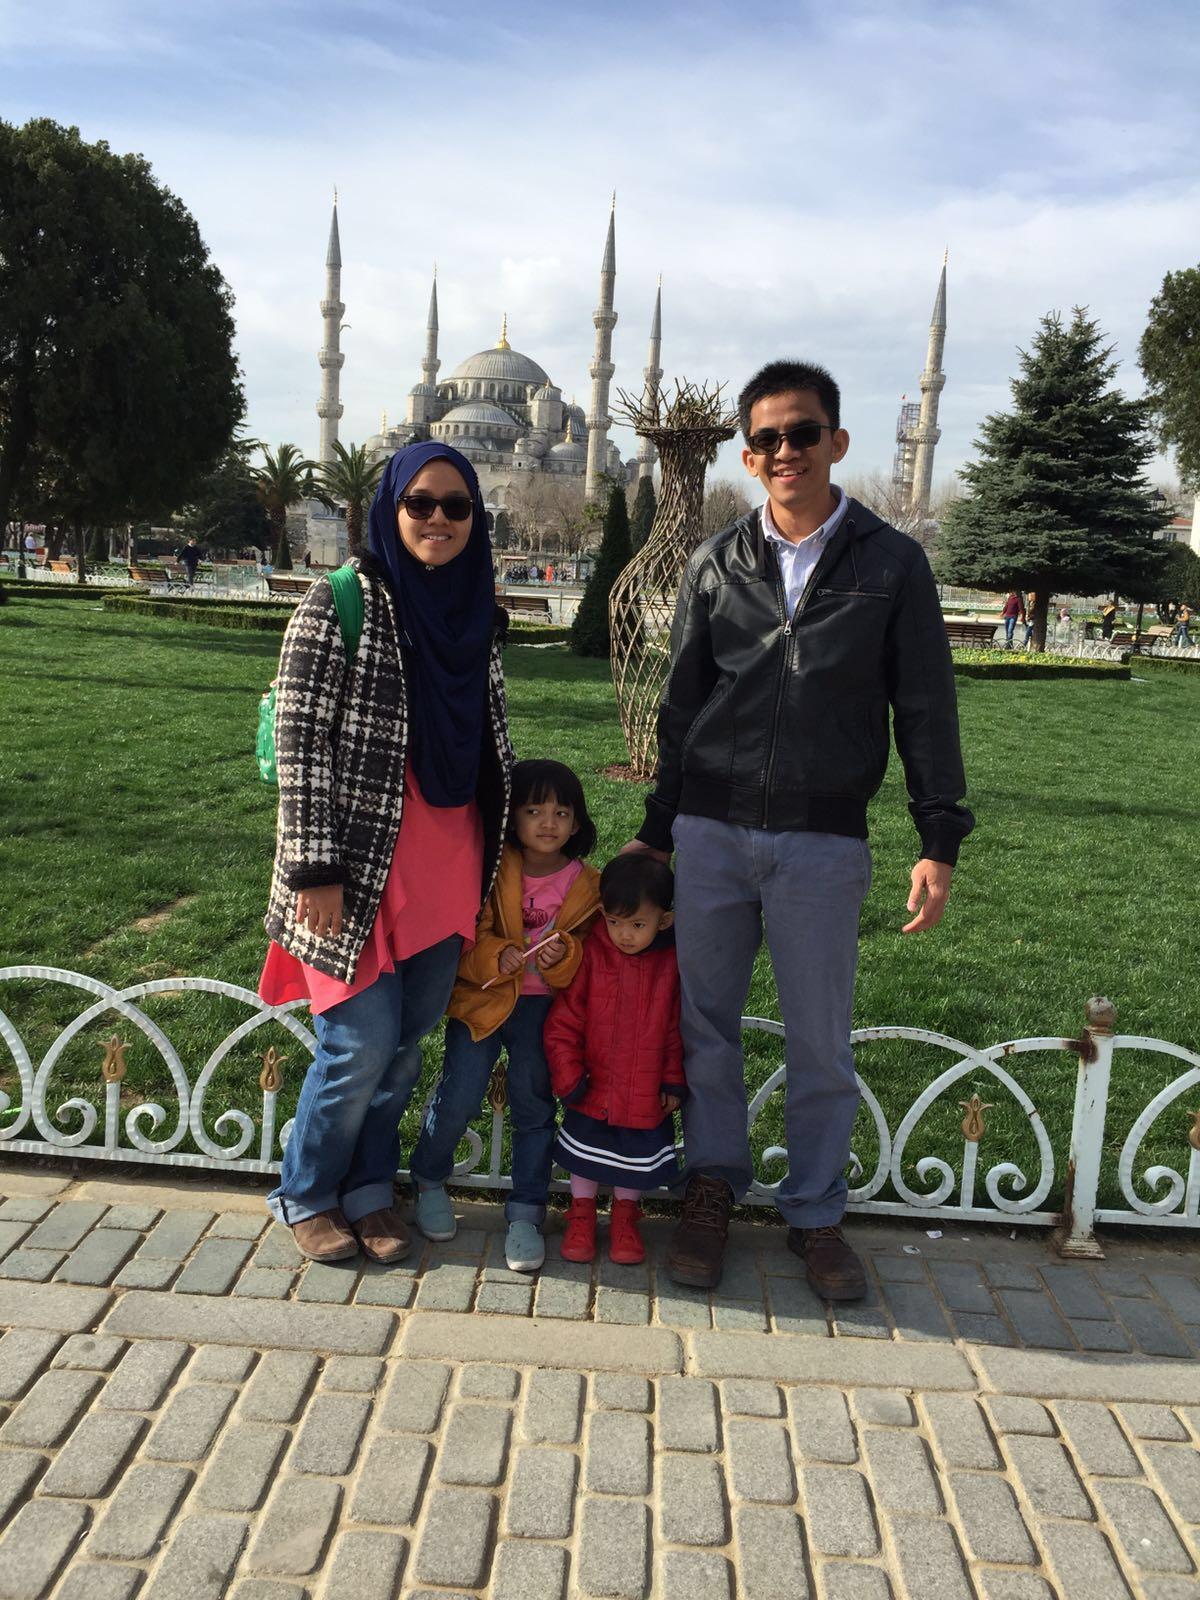 Istanbul,Turki March 2016